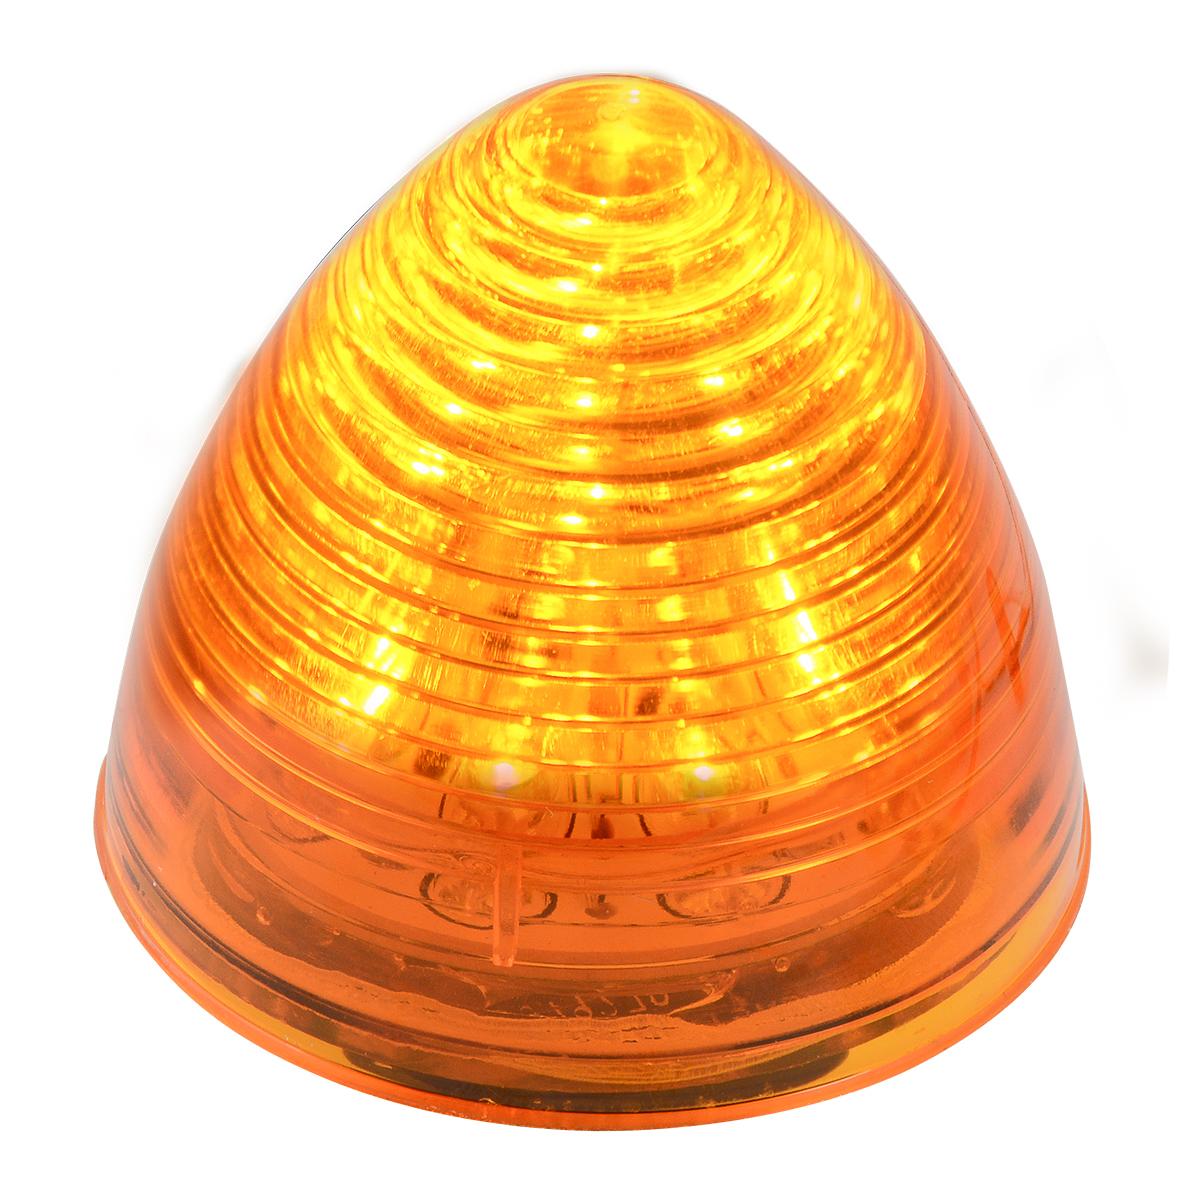 "#79300 2 ½"" LED Beehive Amber/Amber Light"